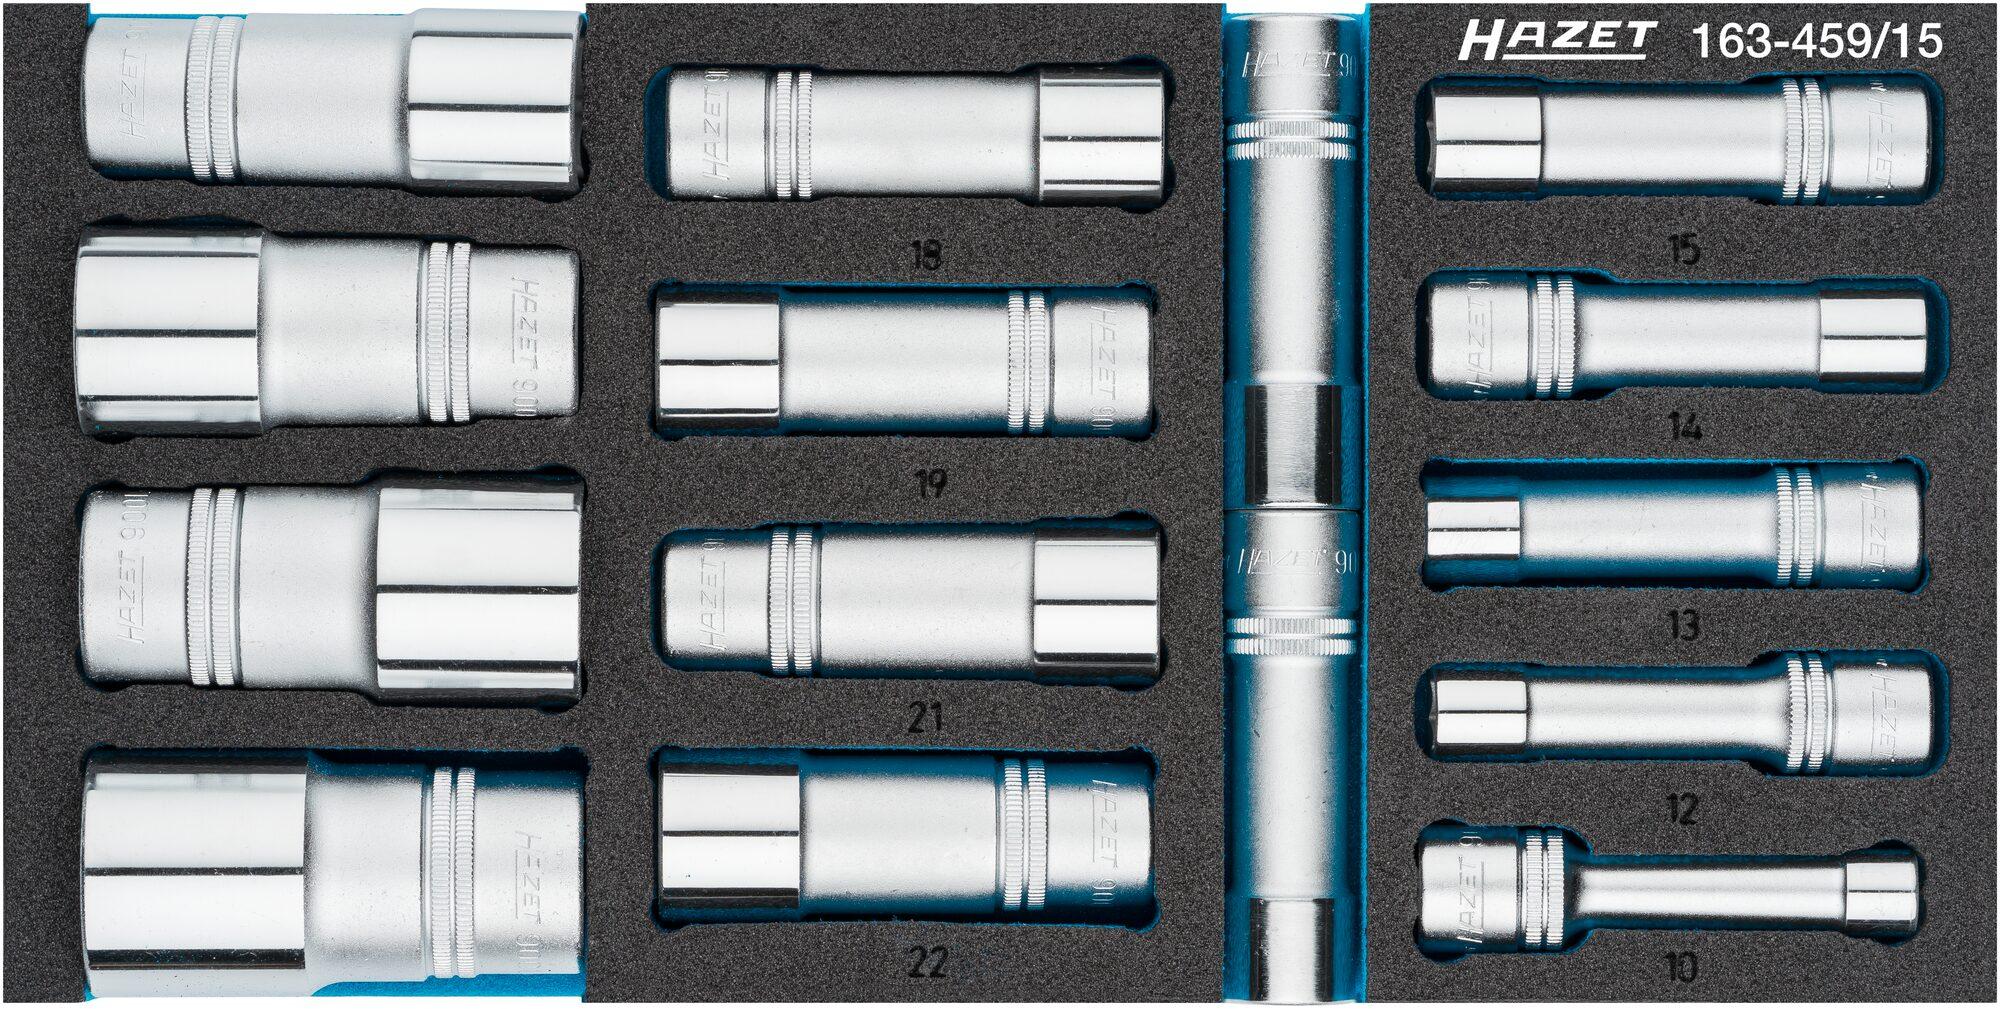 HAZET Steckschlüsseleinsatz Satz 163-459/15 ∙ Vierkant hohl 12,5 mm (1/2 Zoll) ∙ Außen-Sechskant-Tractionsprofil